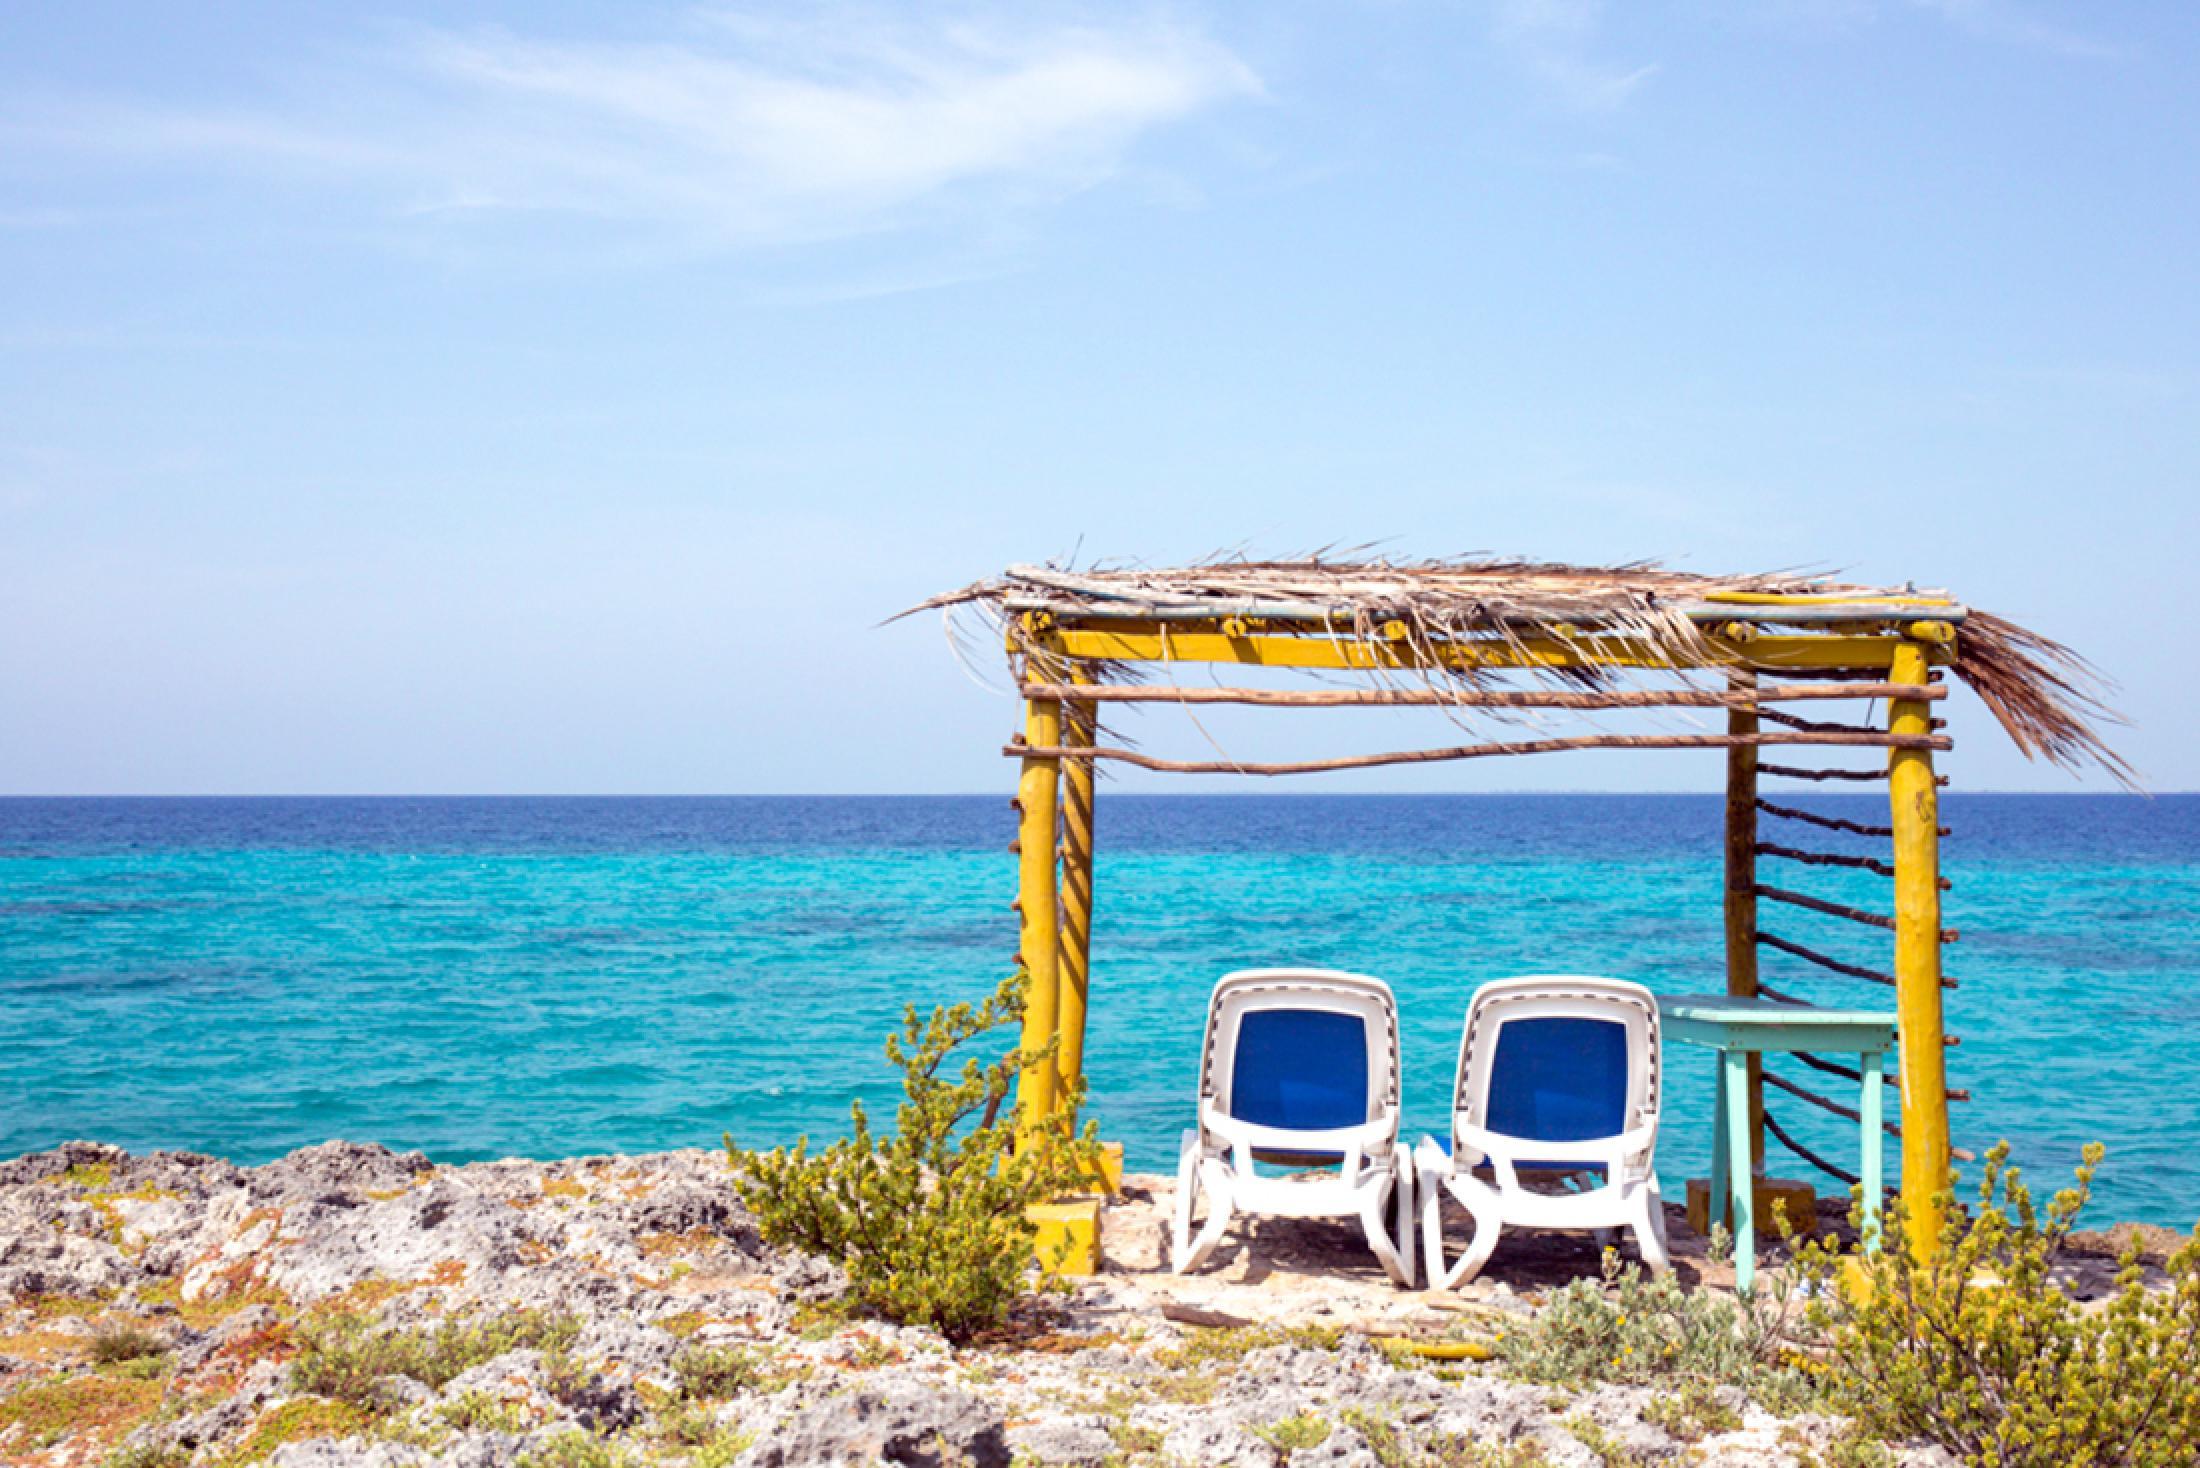 Guama and Playa Giron Day Trip